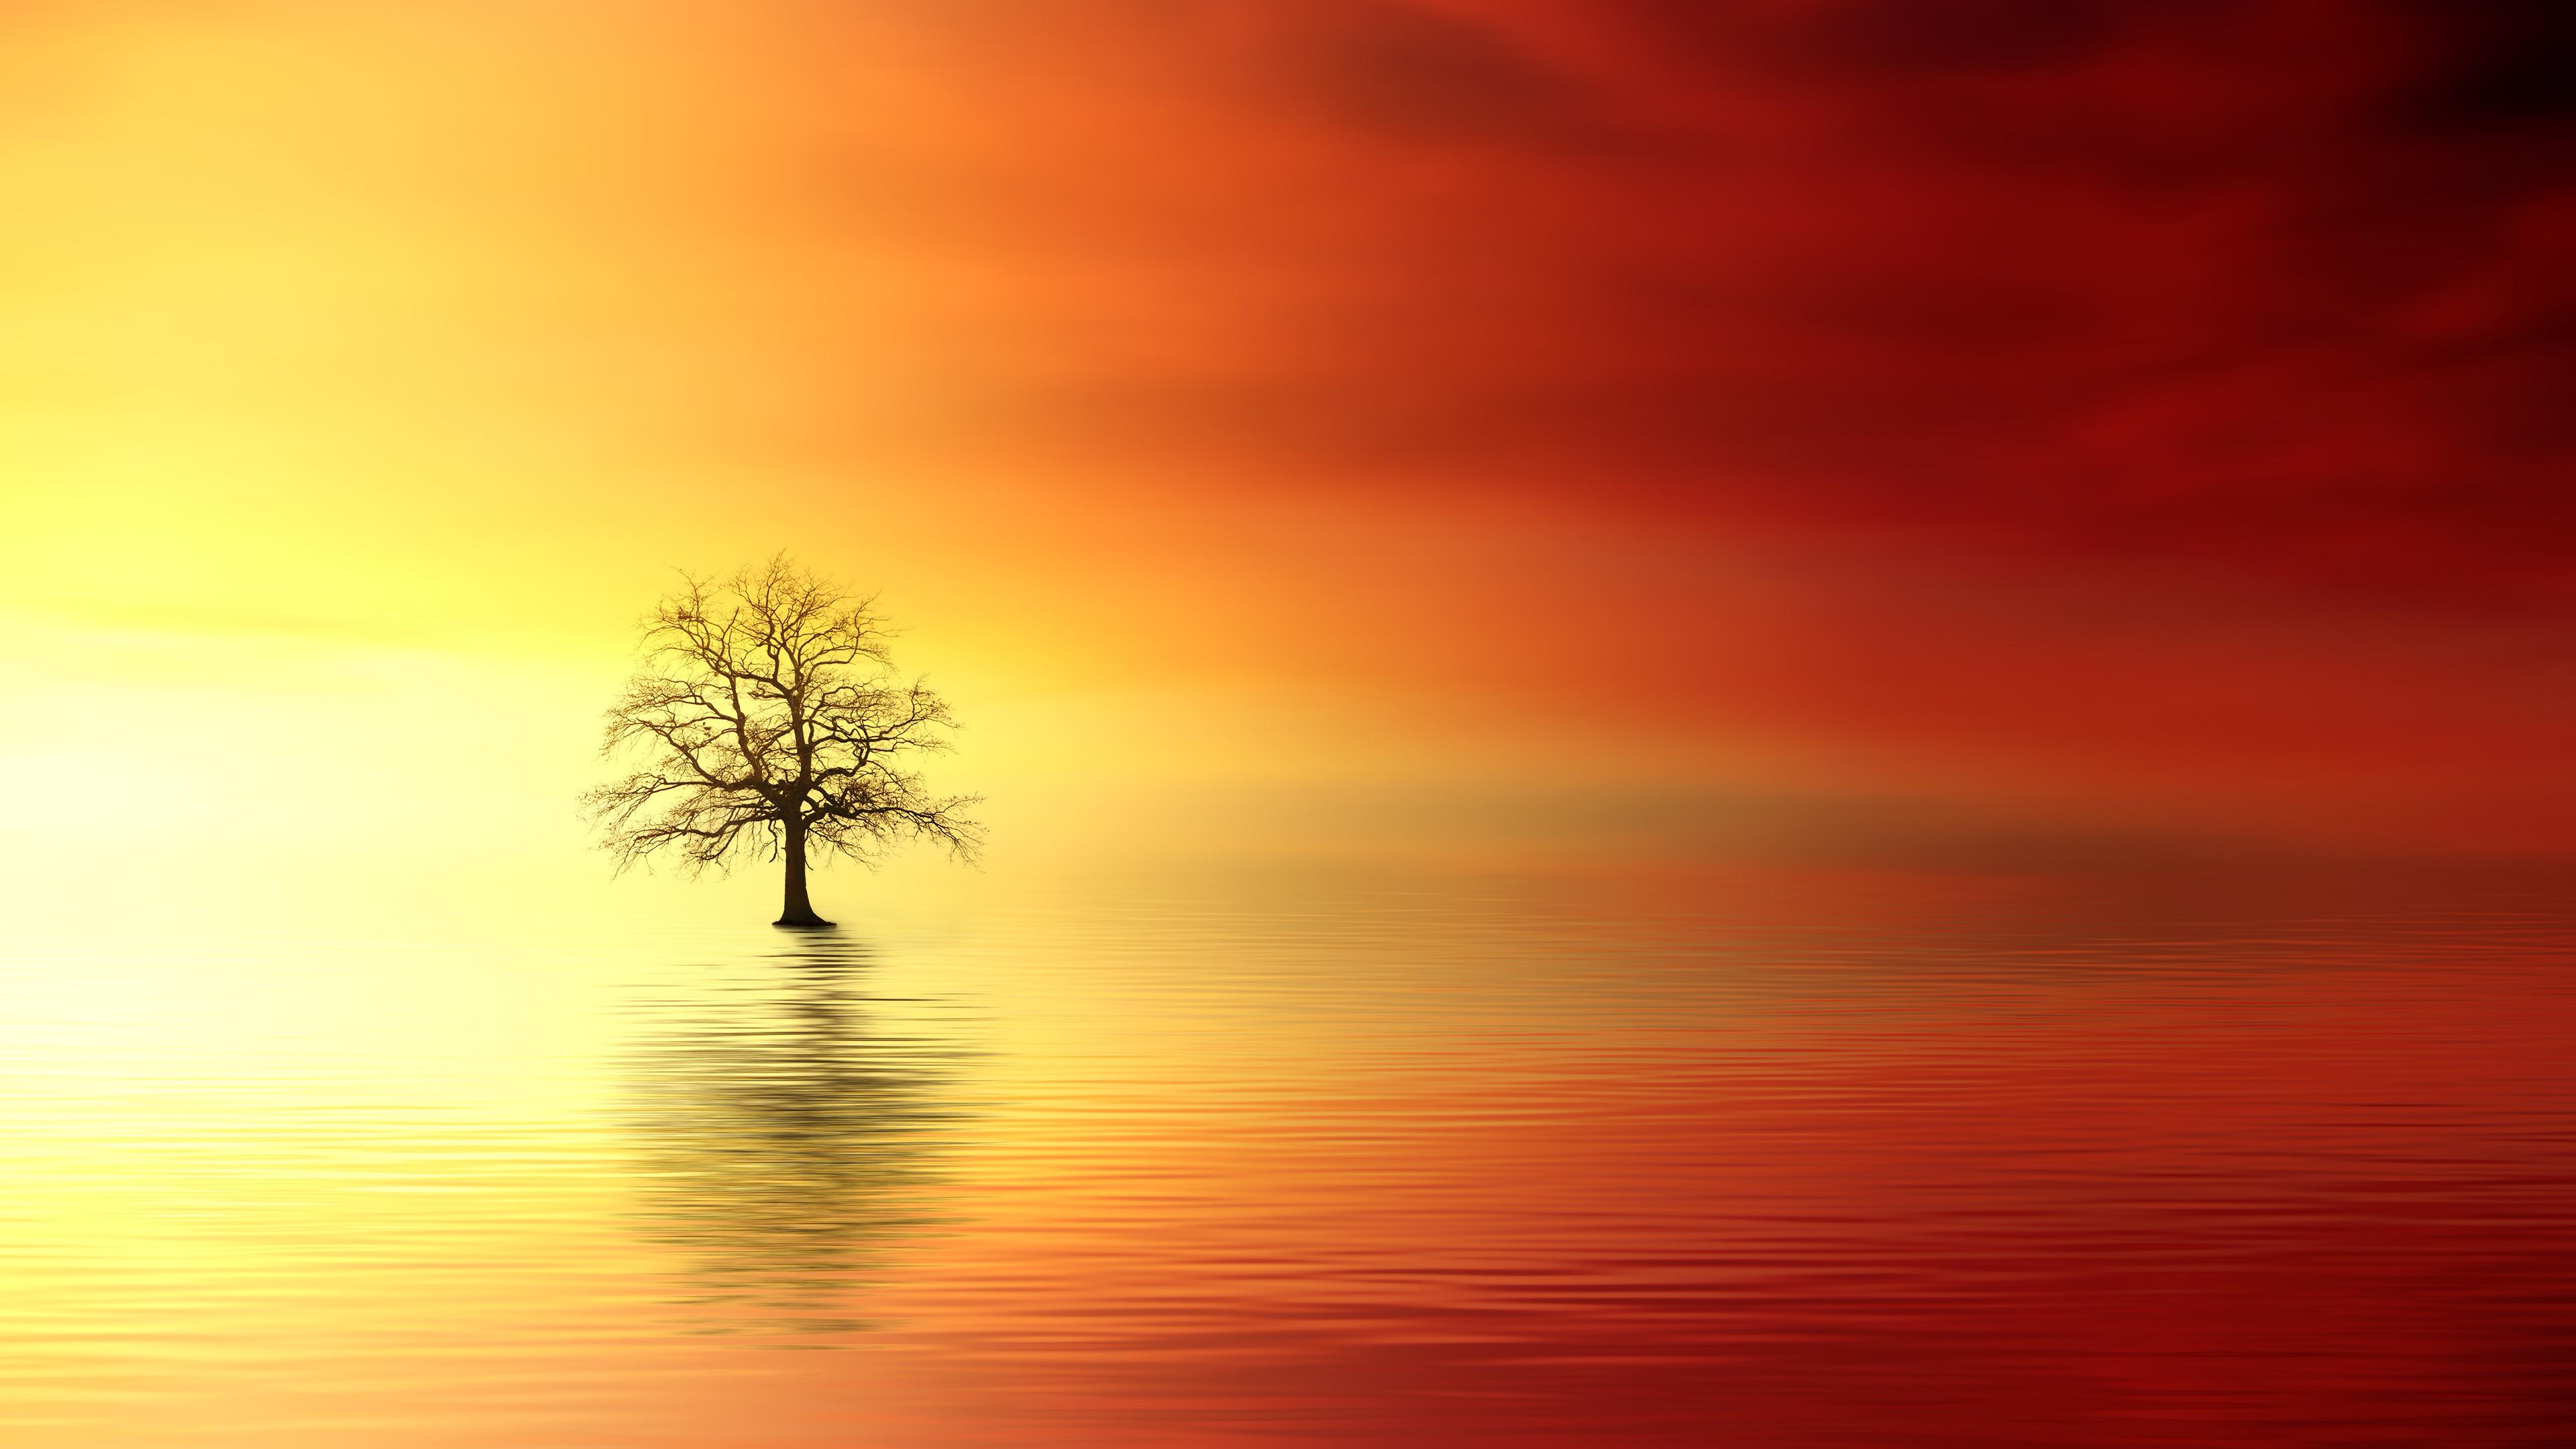 4k Vivid Sunset Wallpaper Uhd 3840 X 2160 Px